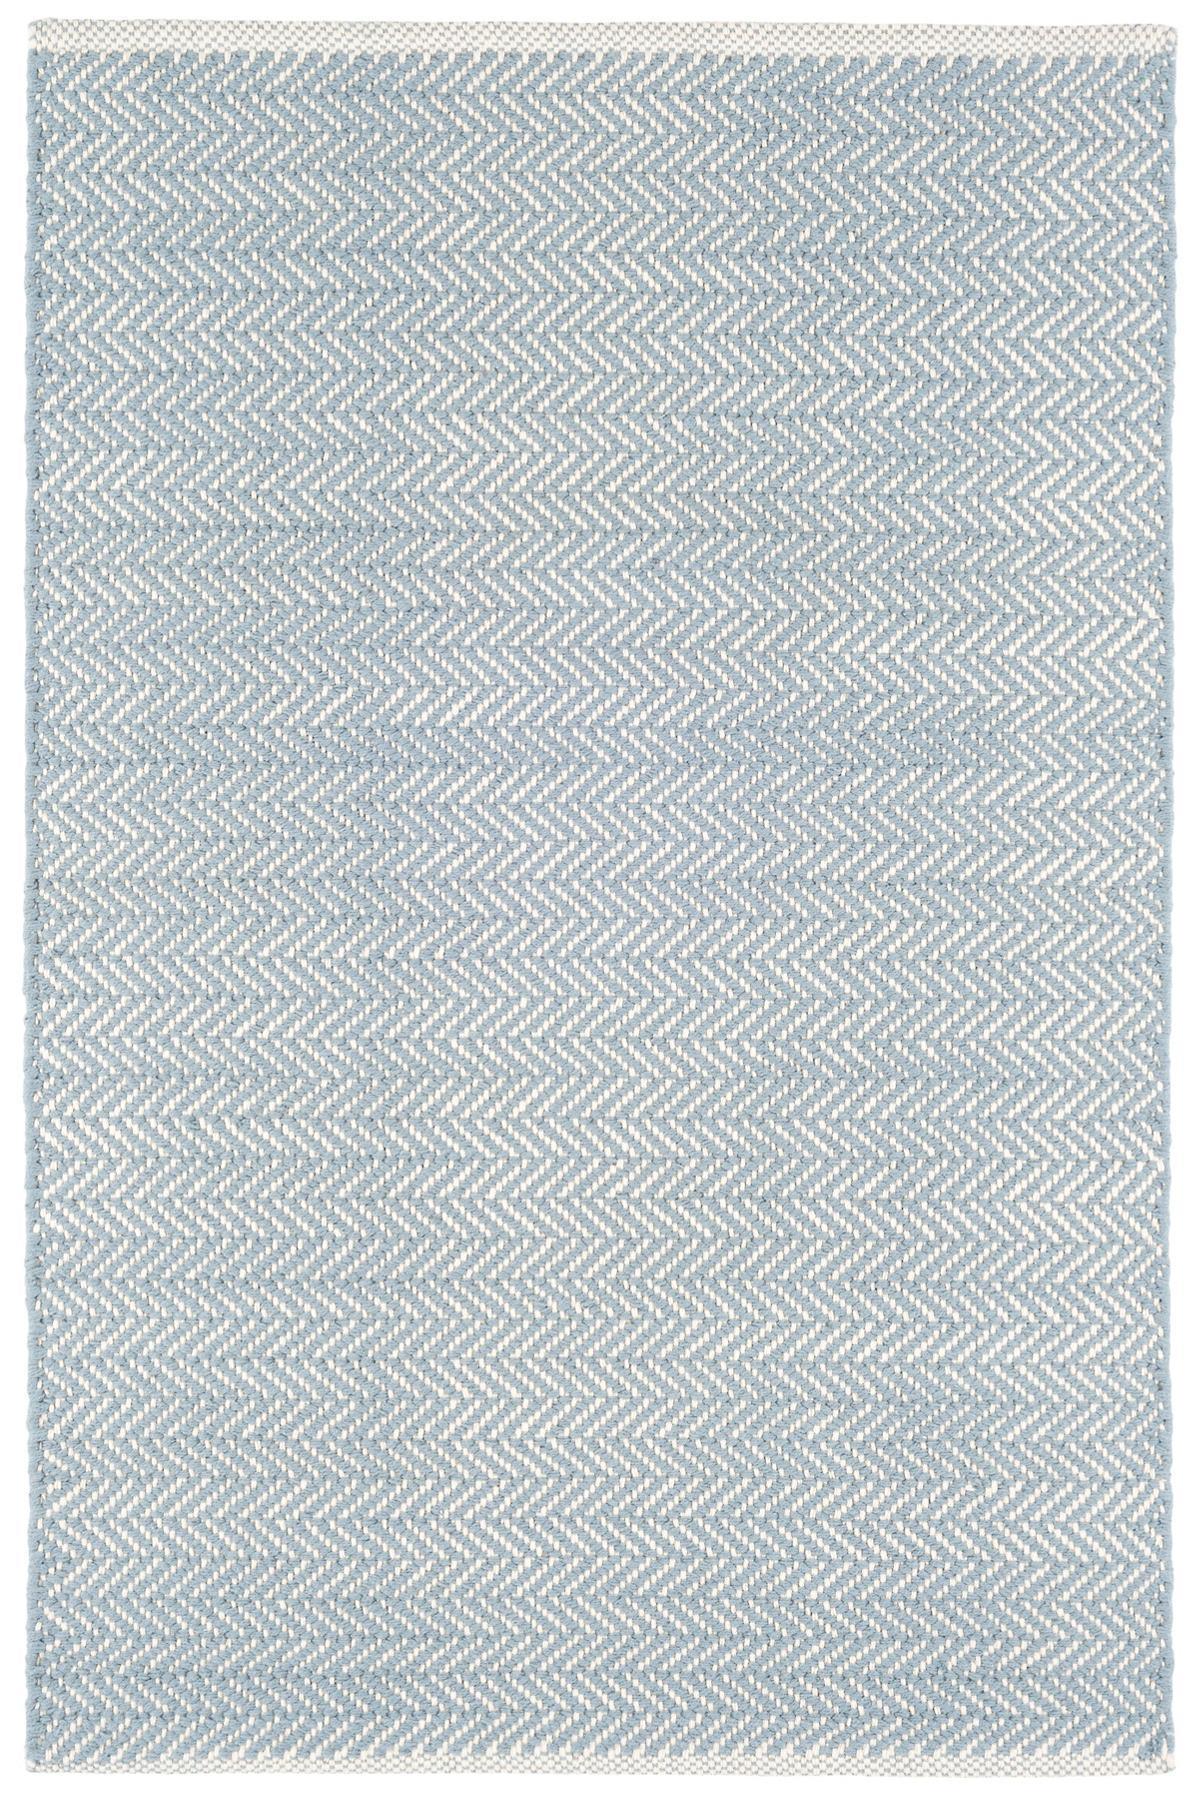 Herringbone Swedish Blue Woven Cotton